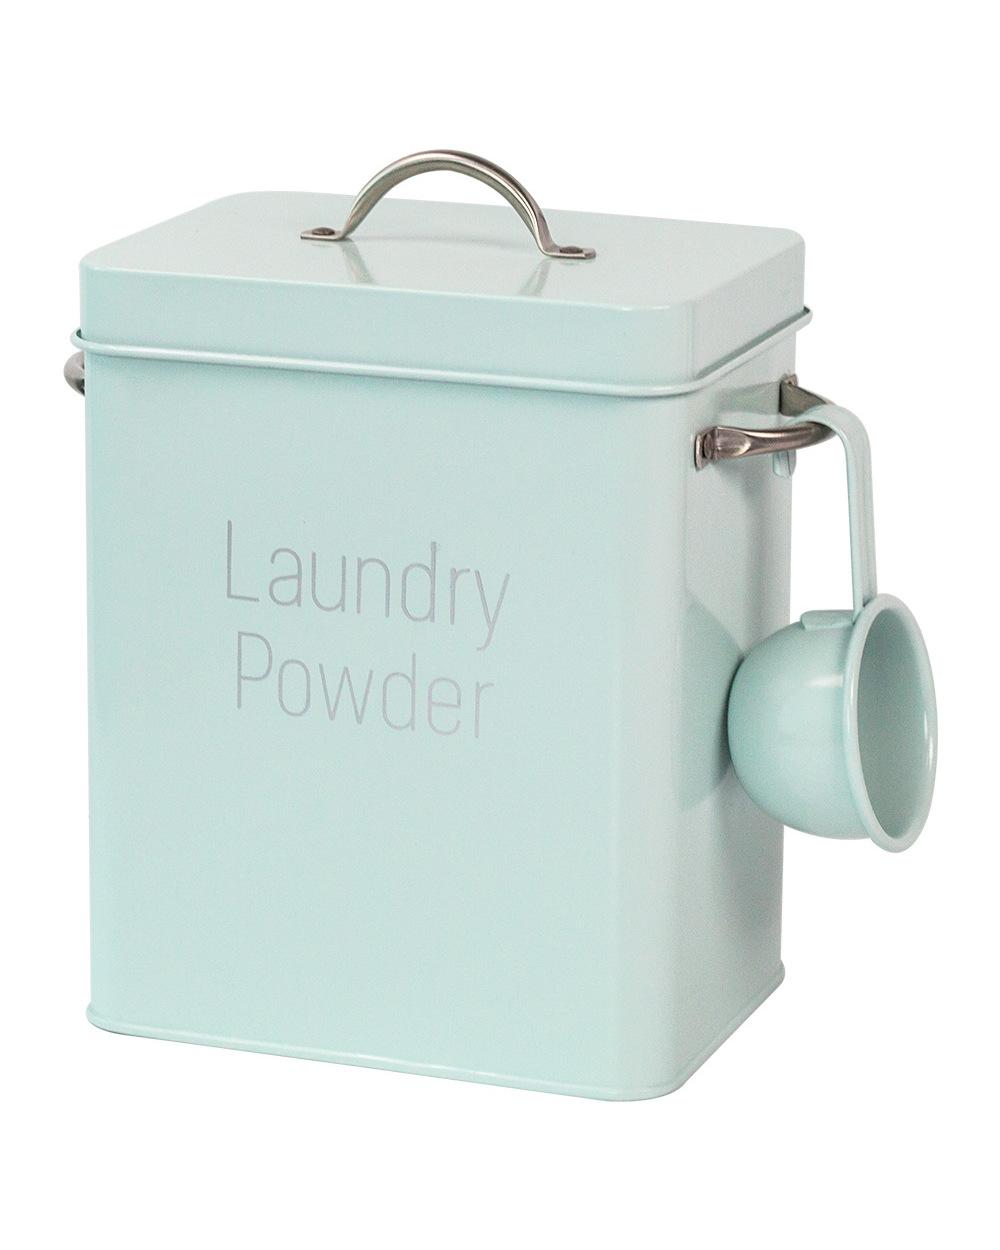 Laundry Storage Box  Laundry Powder Storage Box 2